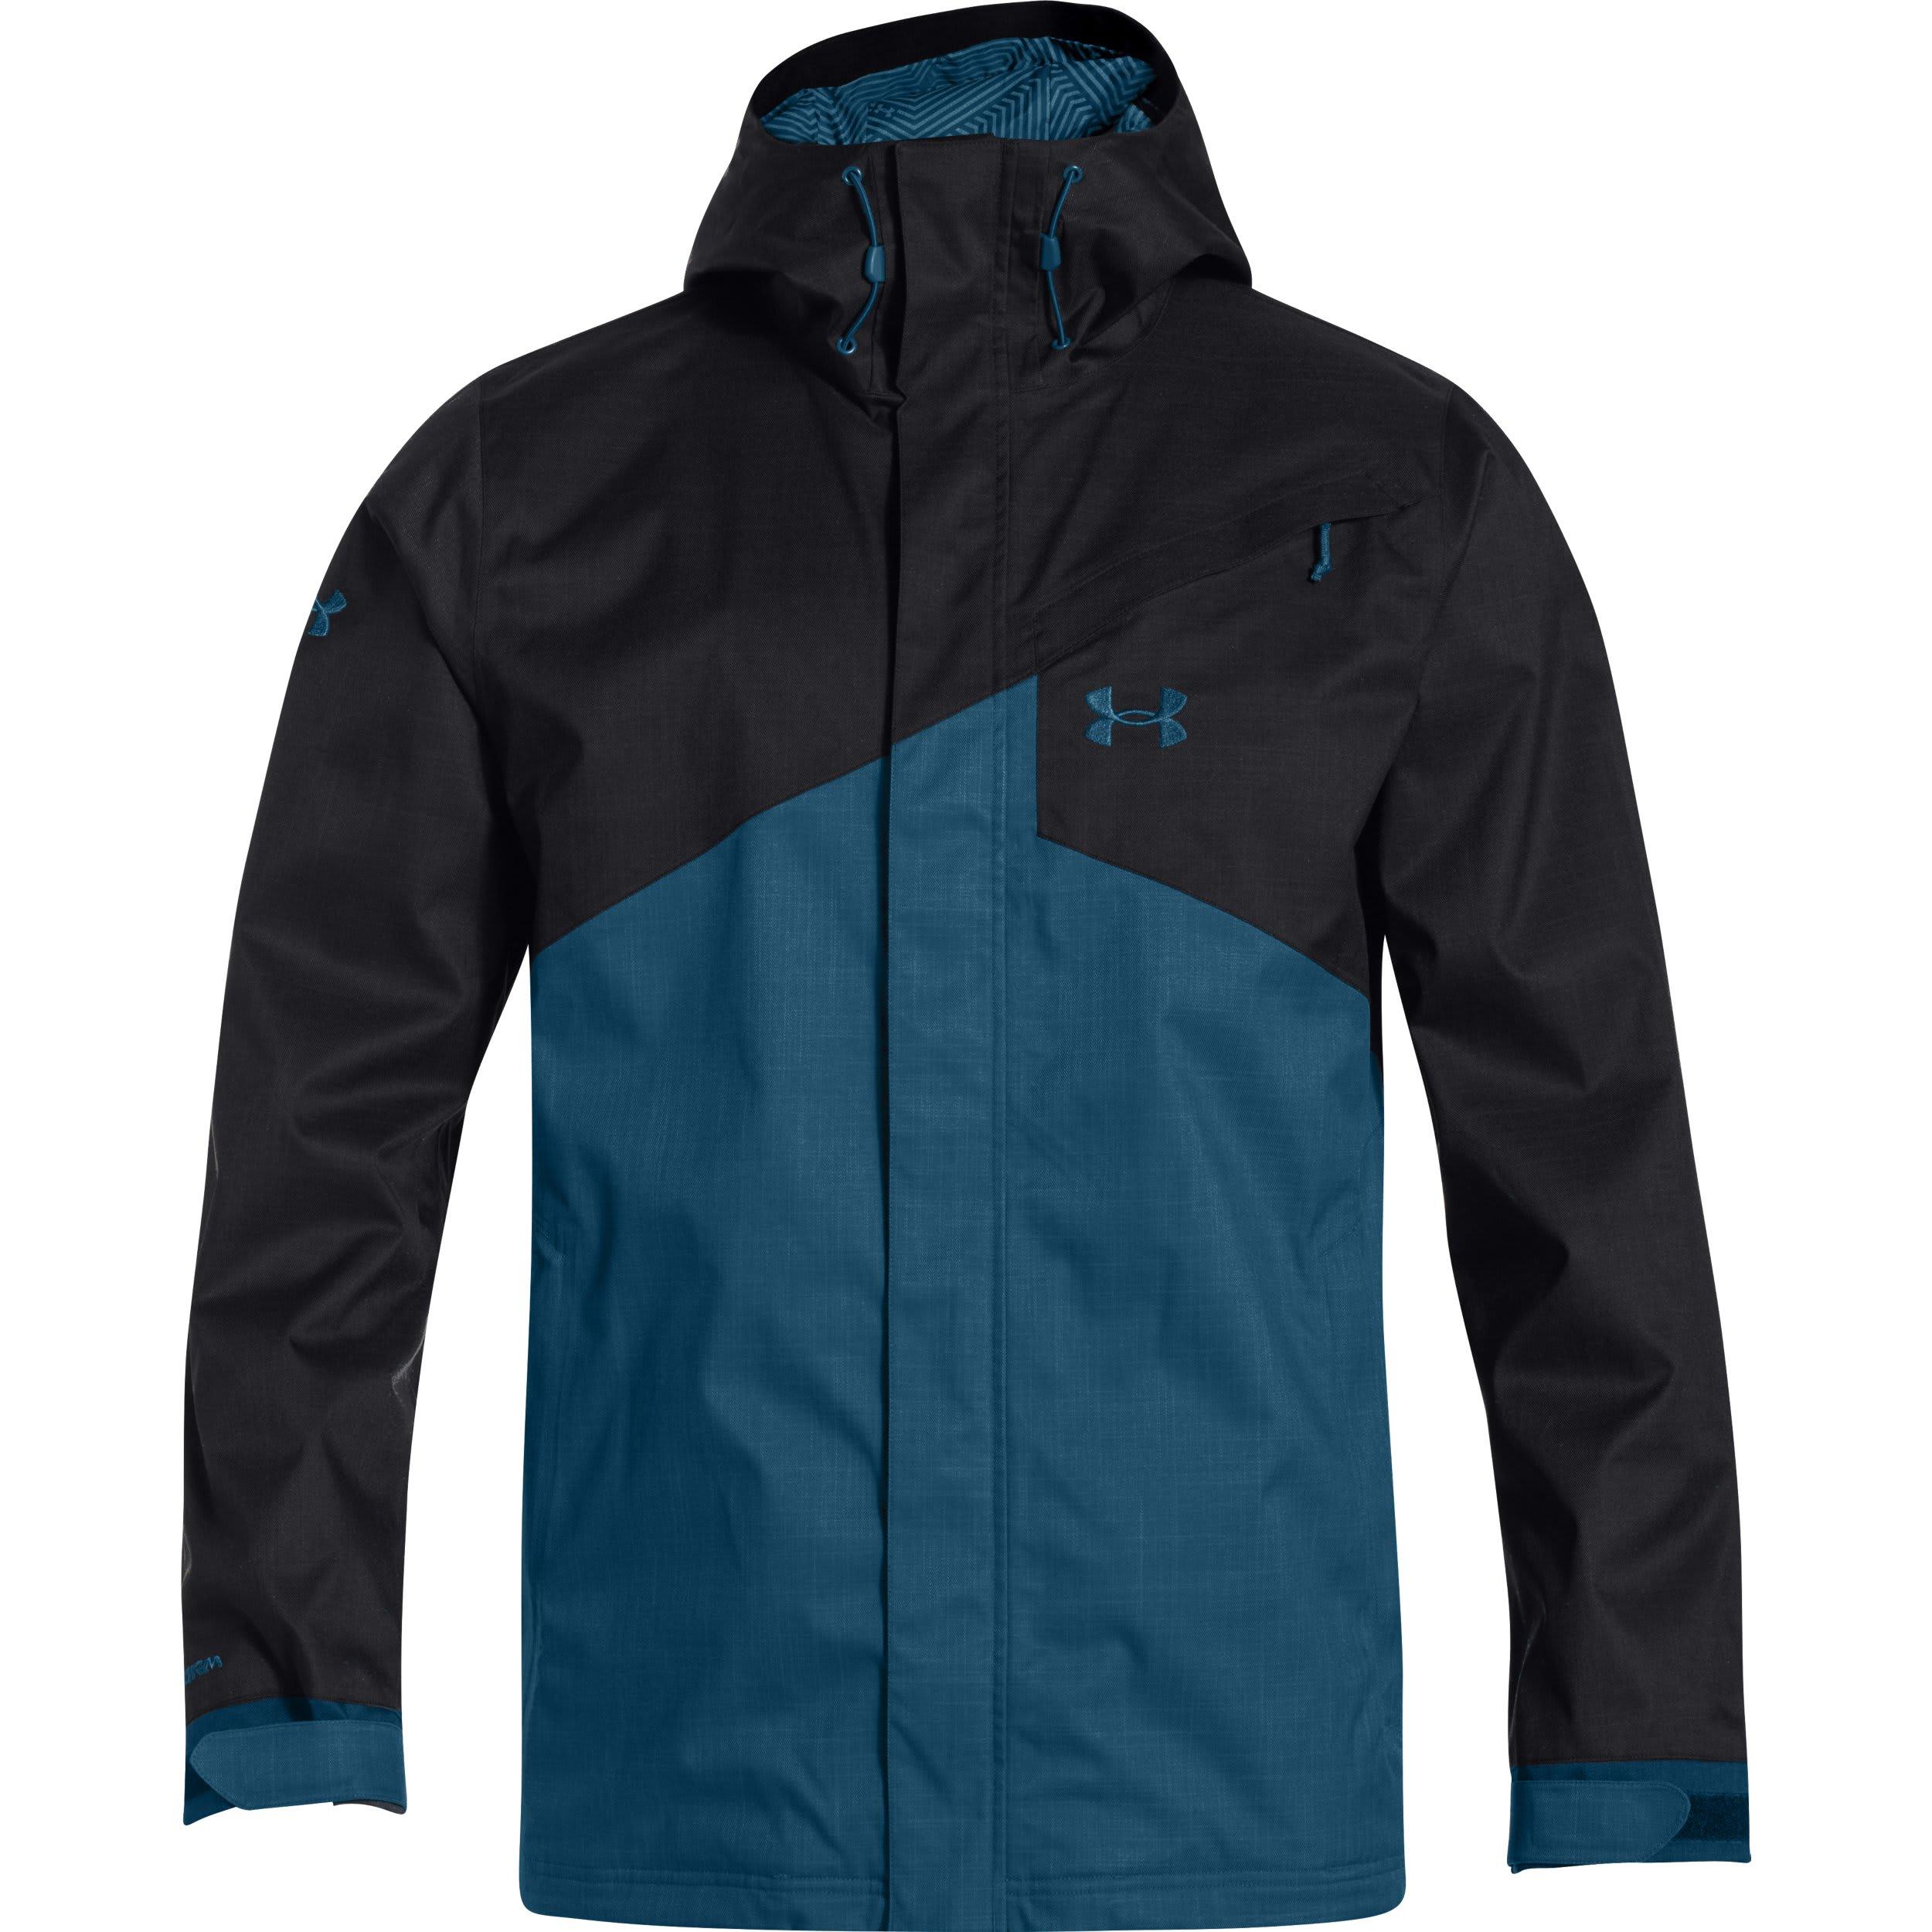 blue under armour jacket